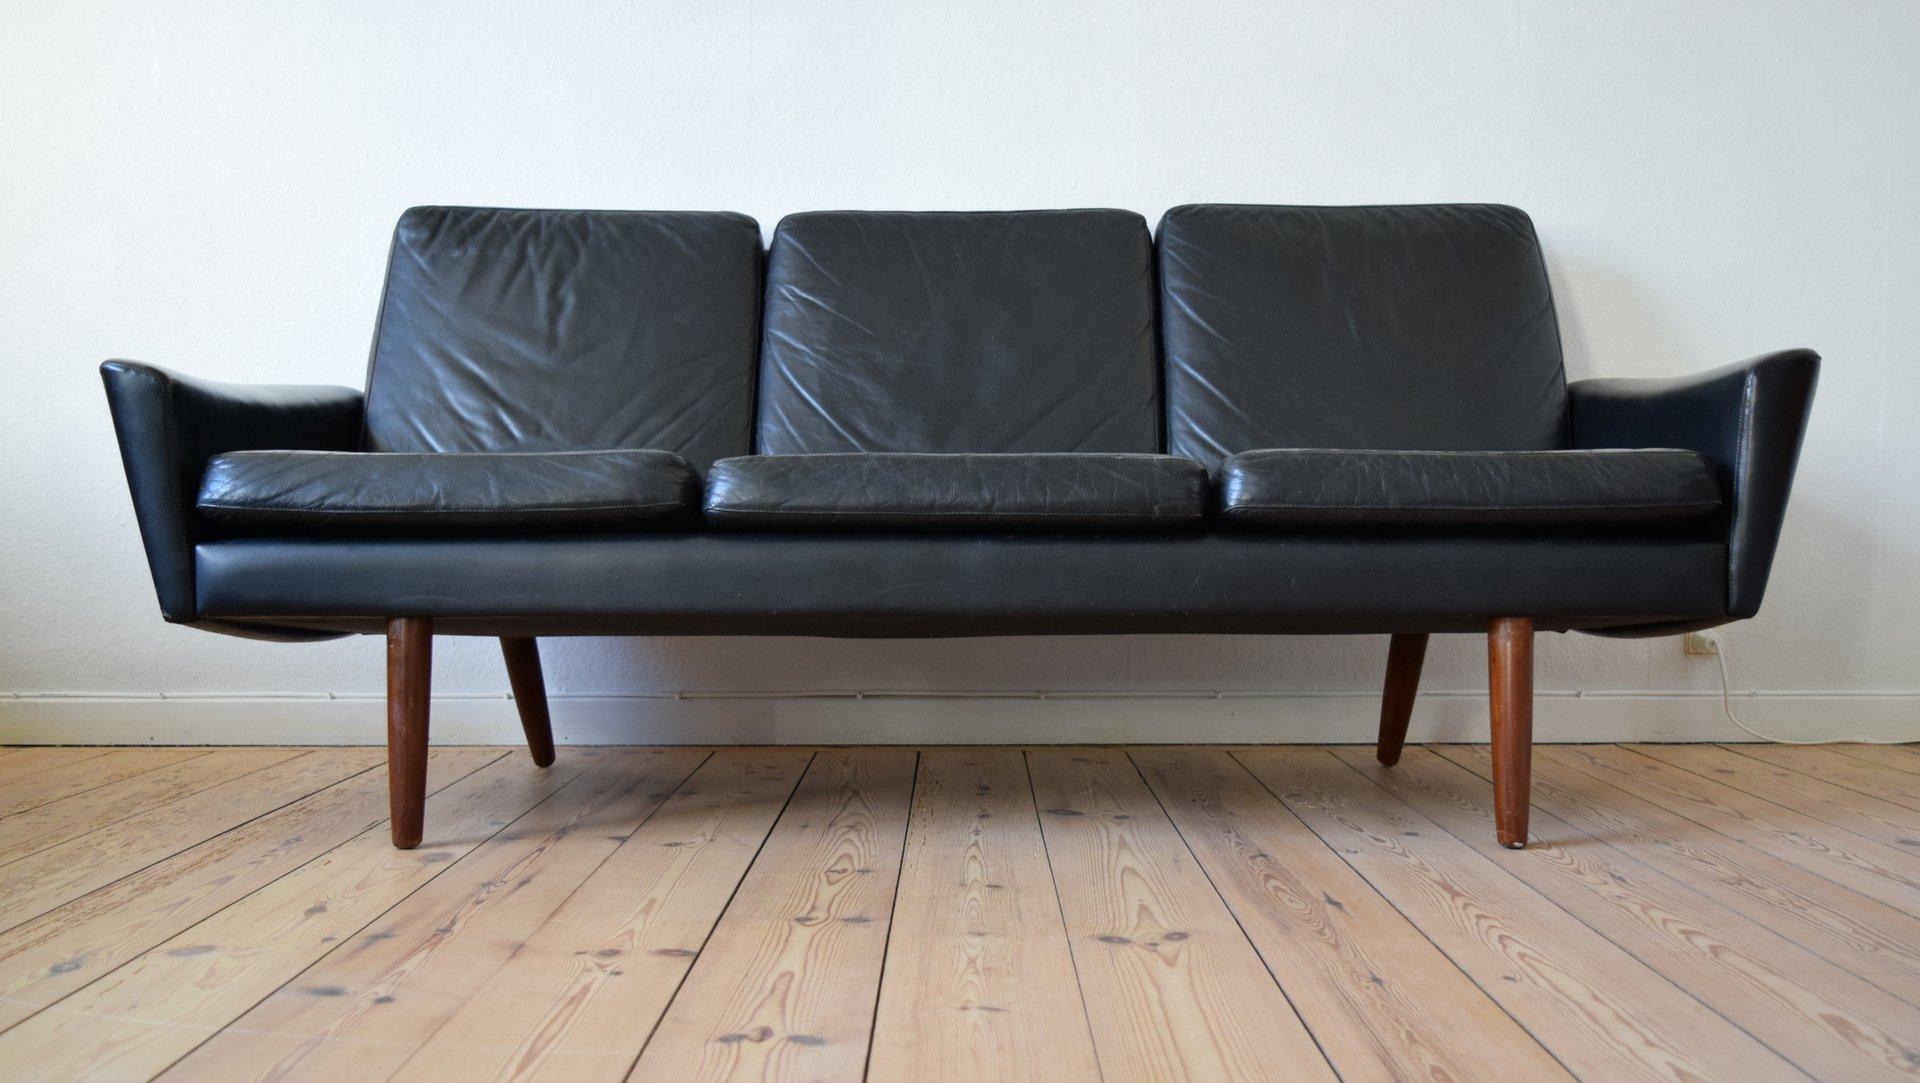 Mid century danish sofa 1960s for sale at pamono for Mid century modern sofa for sale